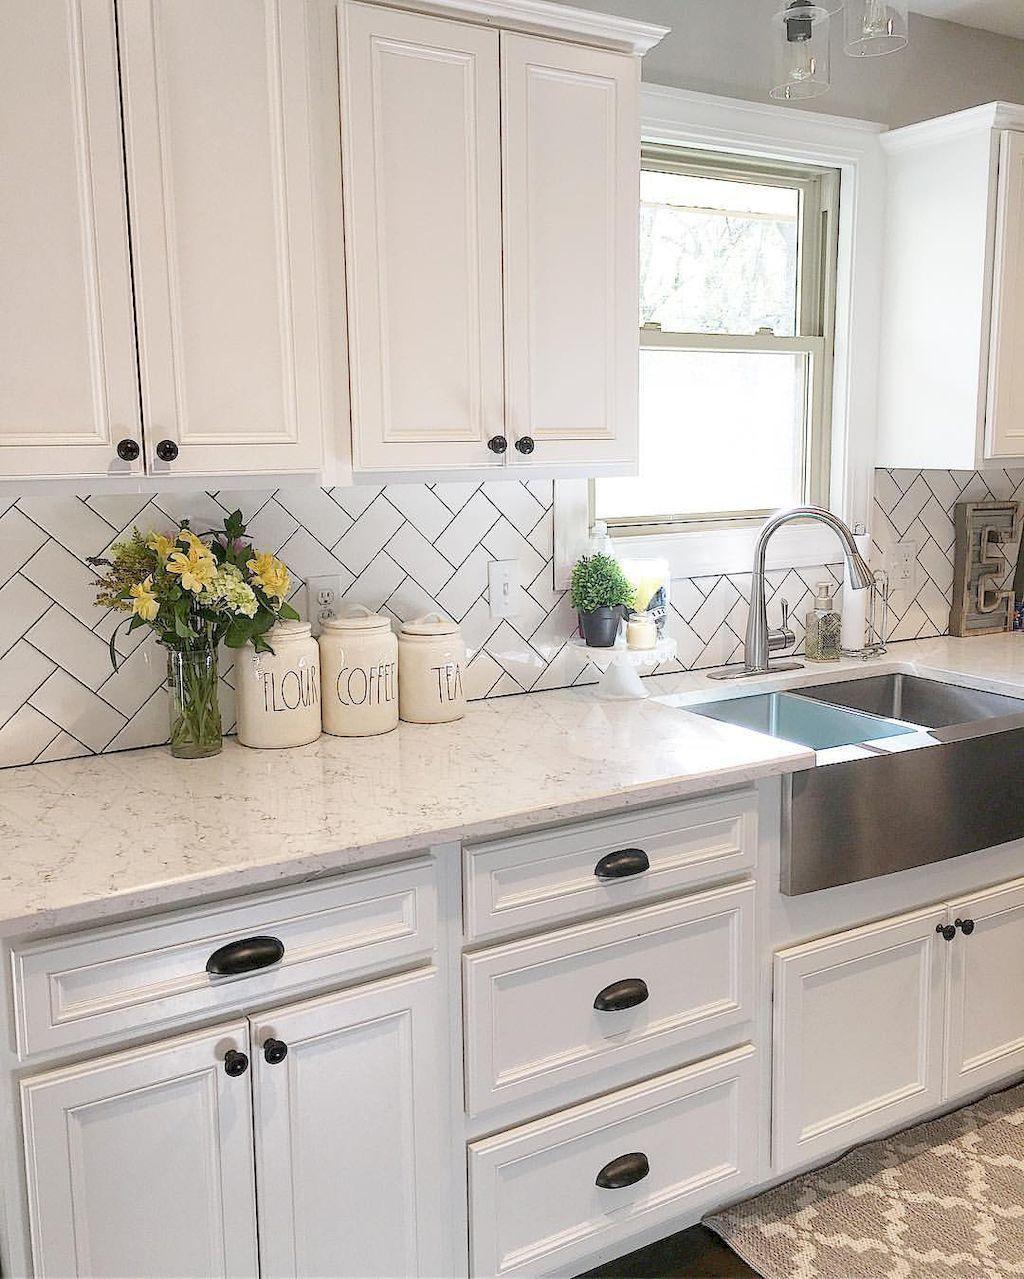 75 Beautiful Farmhouse Kitchen Backsplash Design Ideas Kitchen